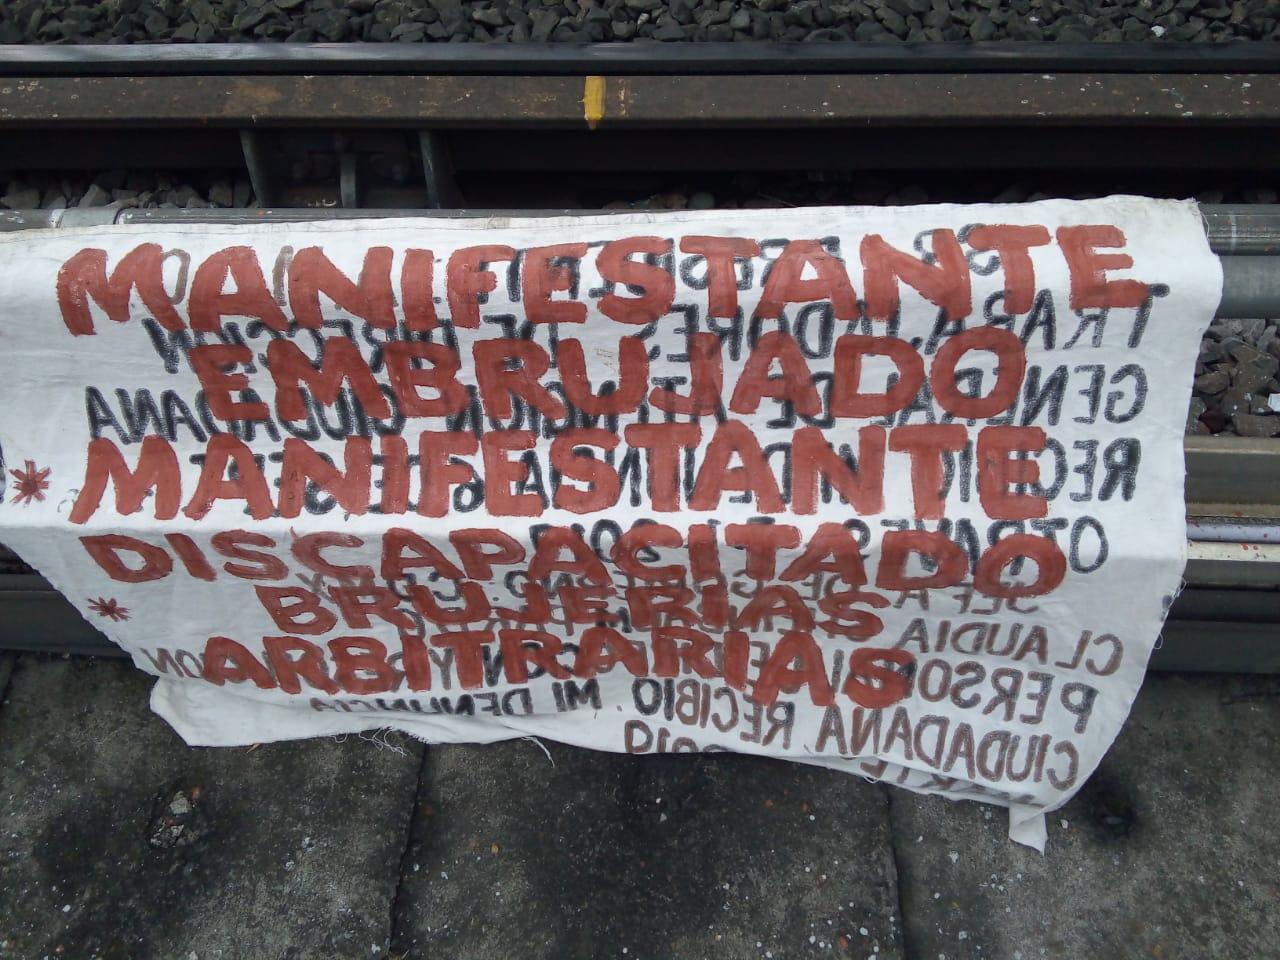 Elementos de la PBI de la SSC arrestan a un Hombre que intentó colocar una Manta en una estructura del STC Metro